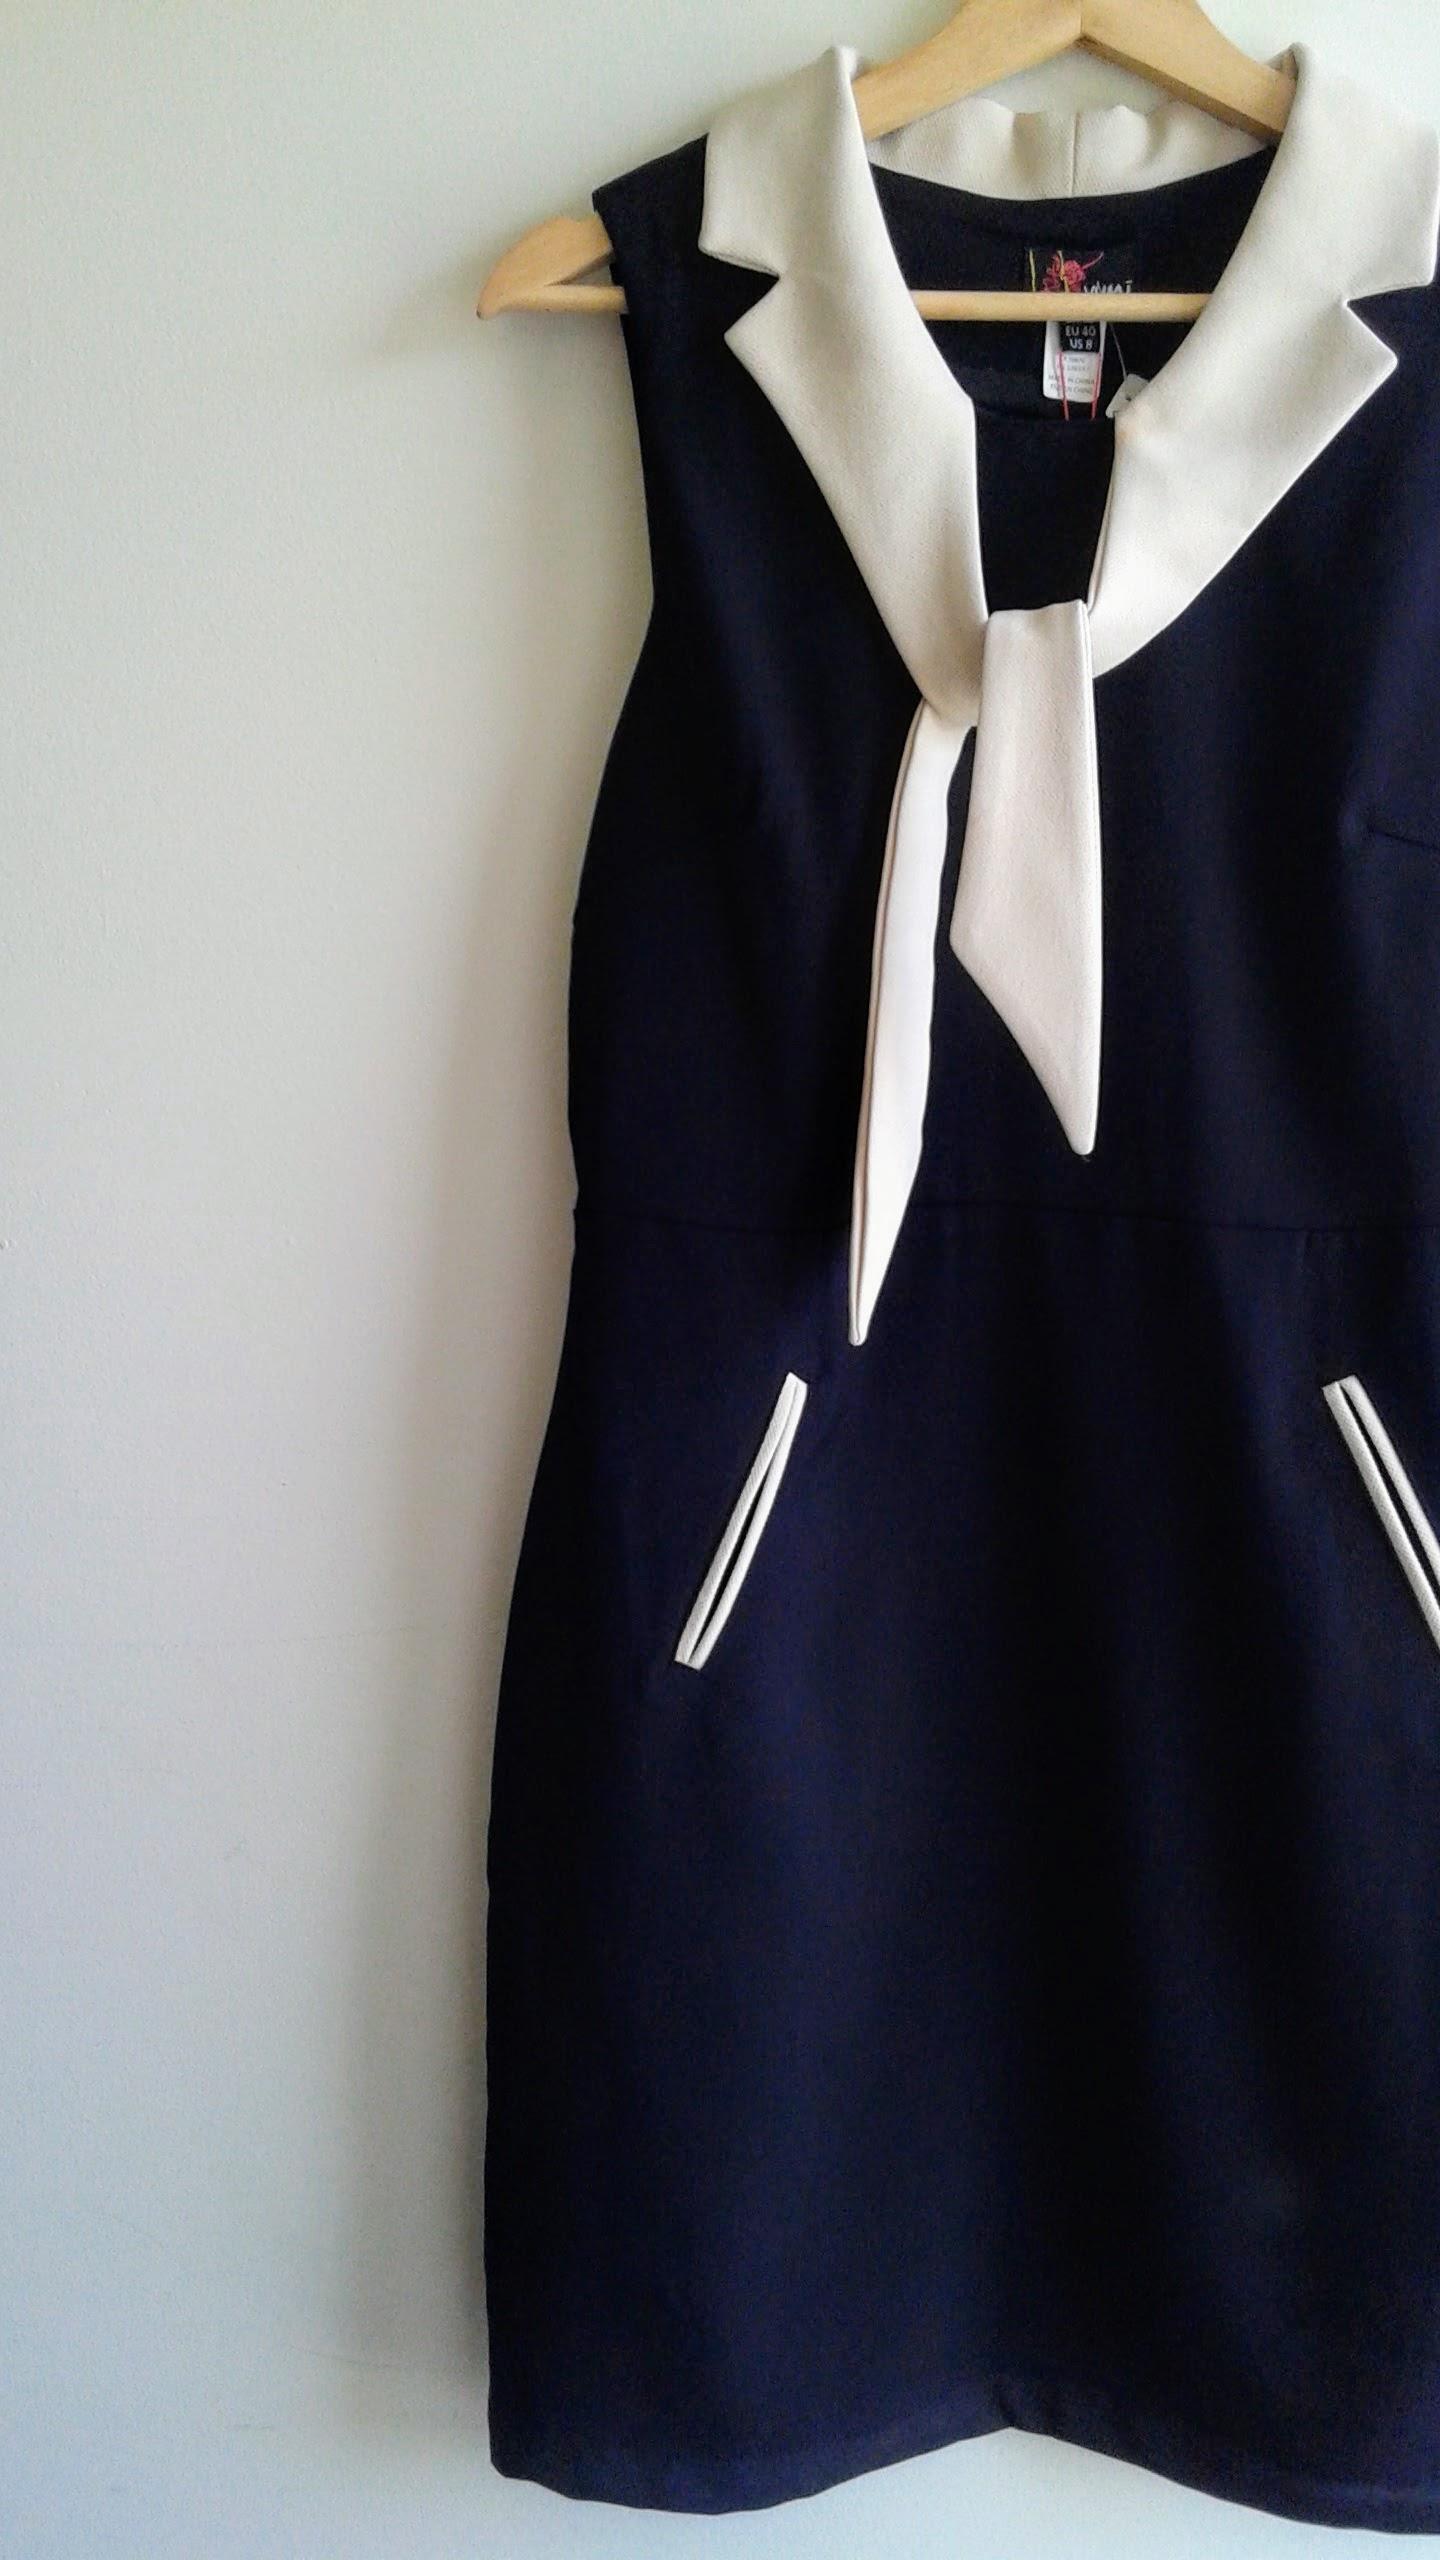 Yumi dress (NWT); Size 8, $48